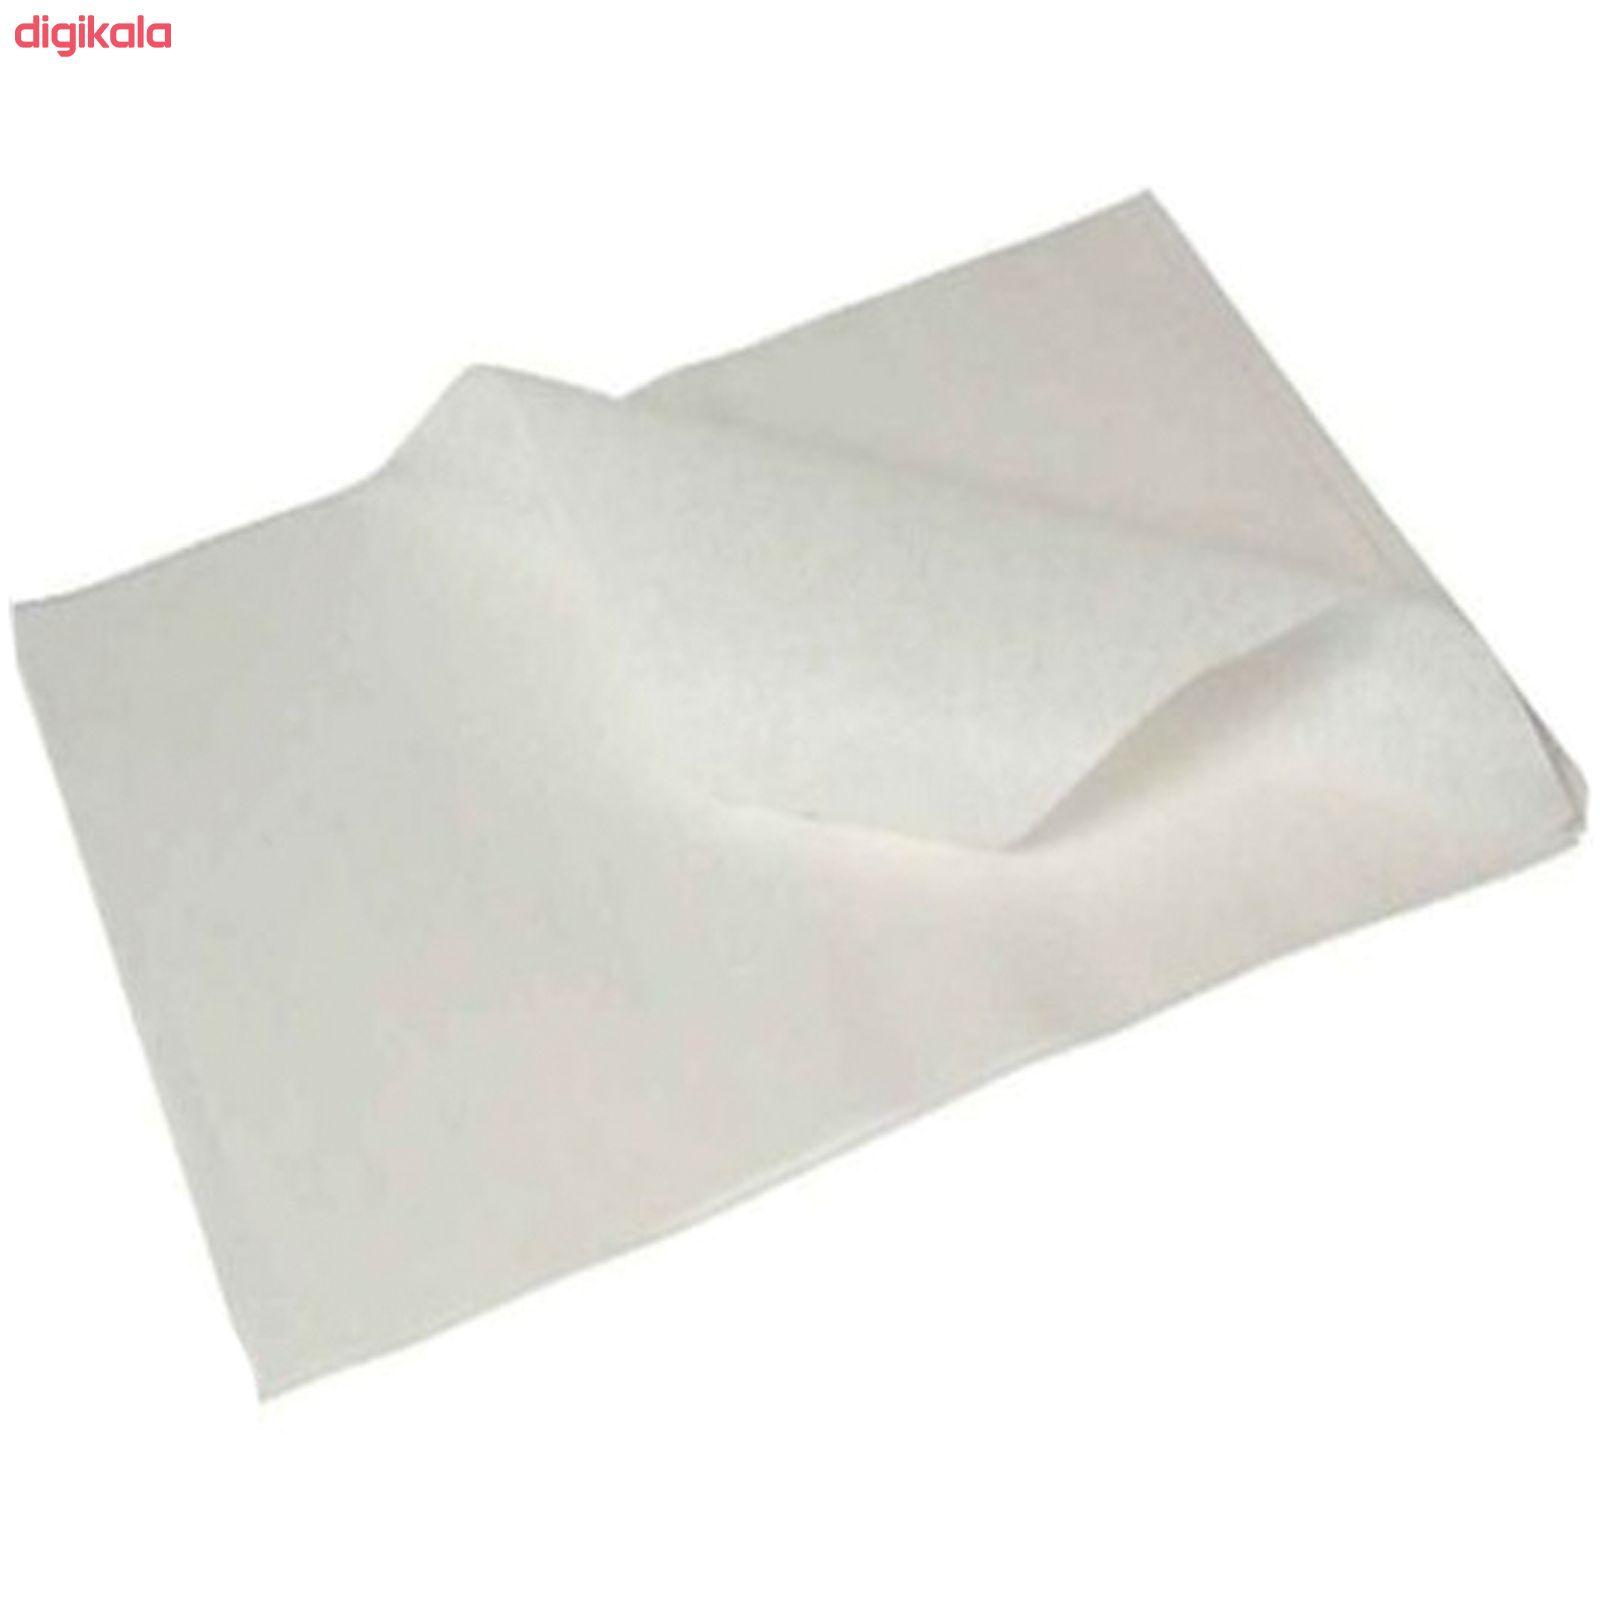 کاغذ پوستی A3 مدل cnd38 بسته 50 عددی  main 1 1